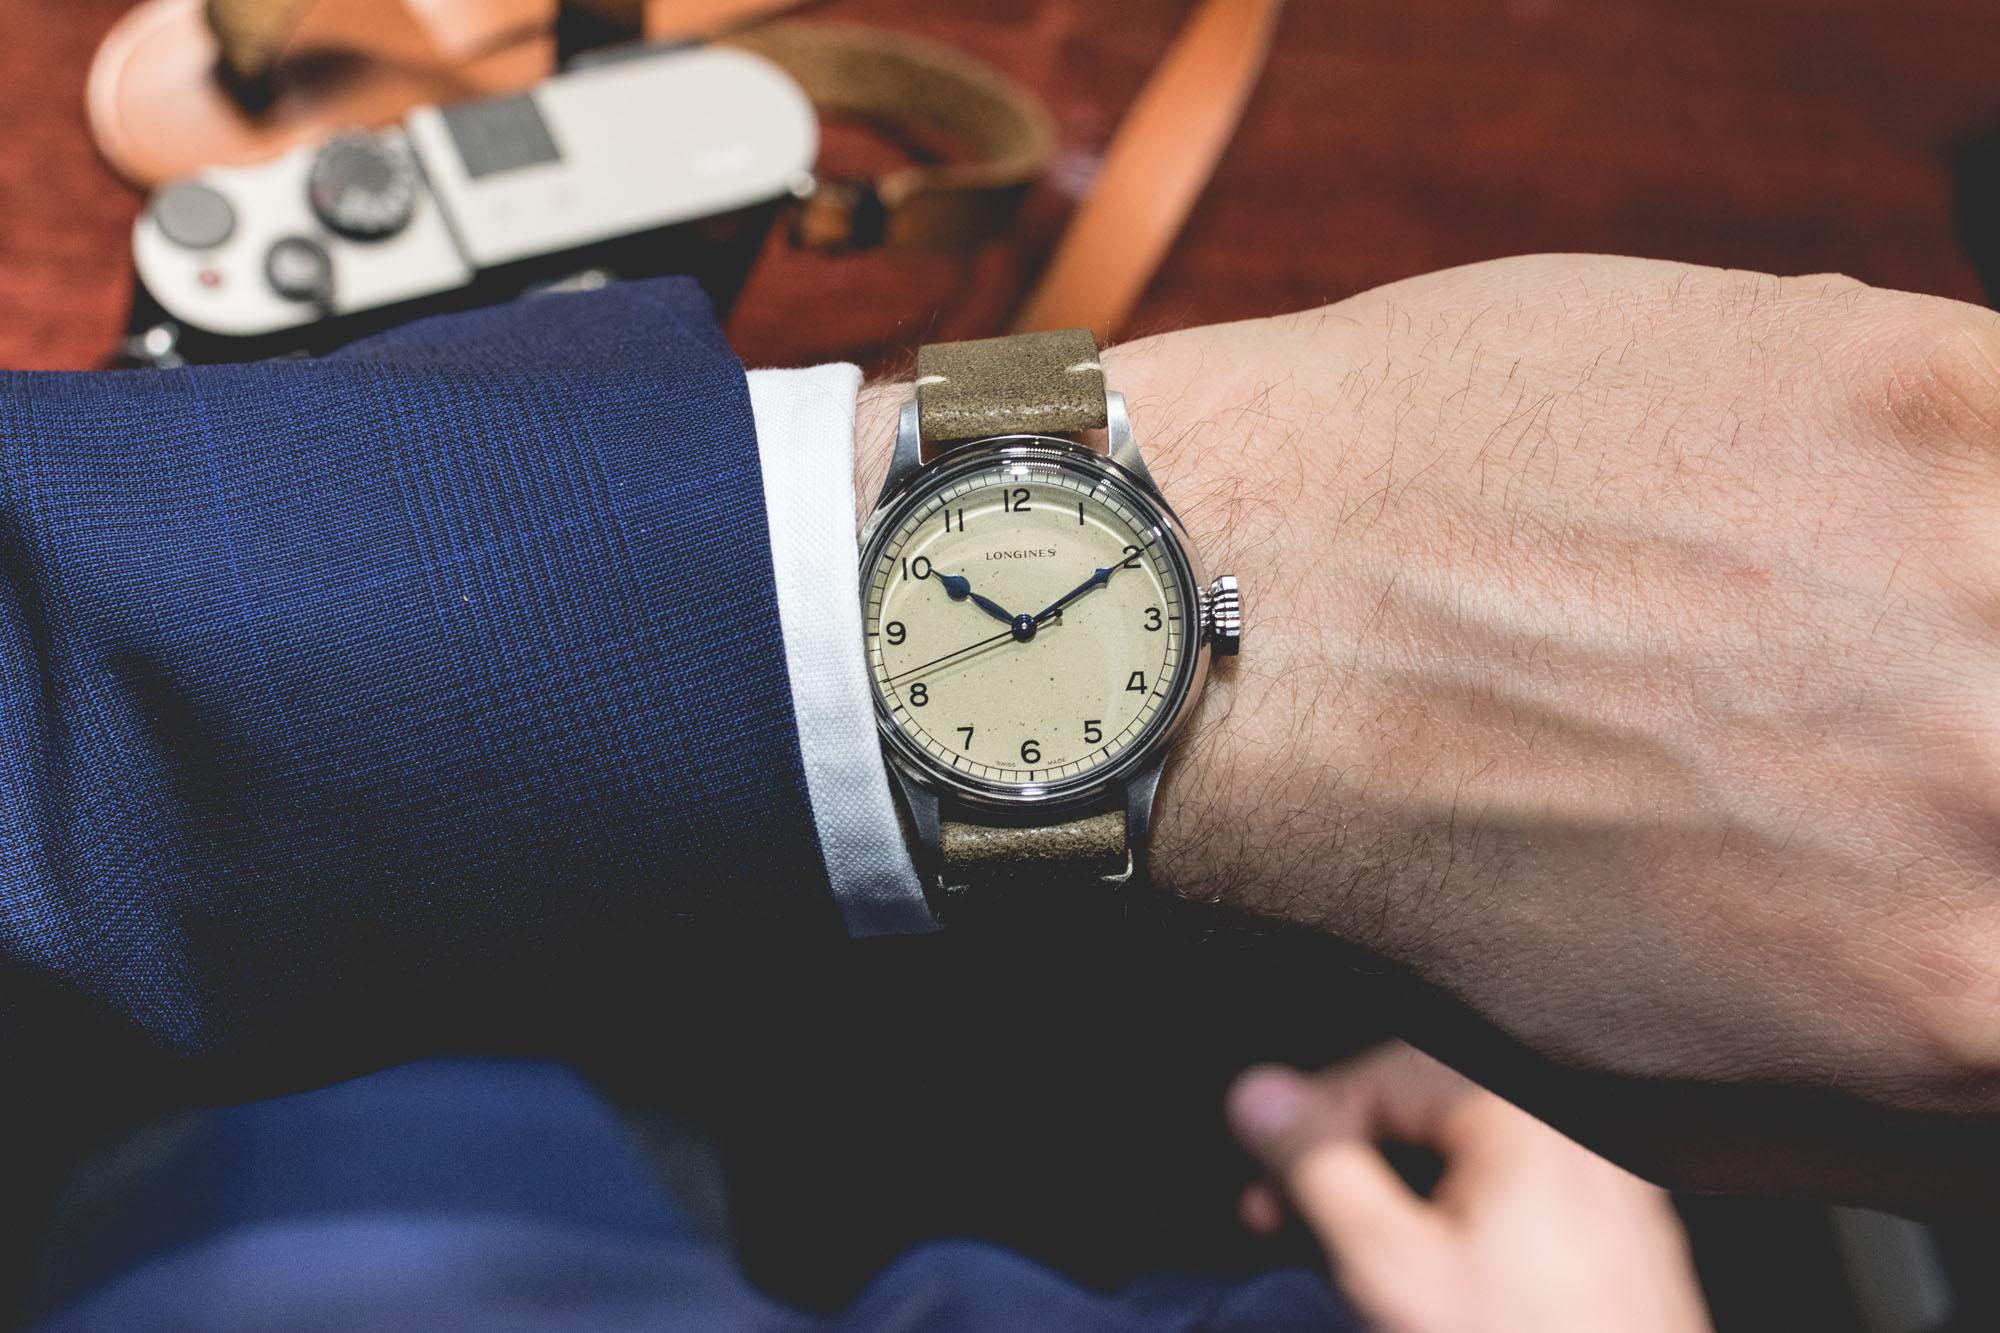 Baselworld 2018 - Longines Heritage Military Wrist